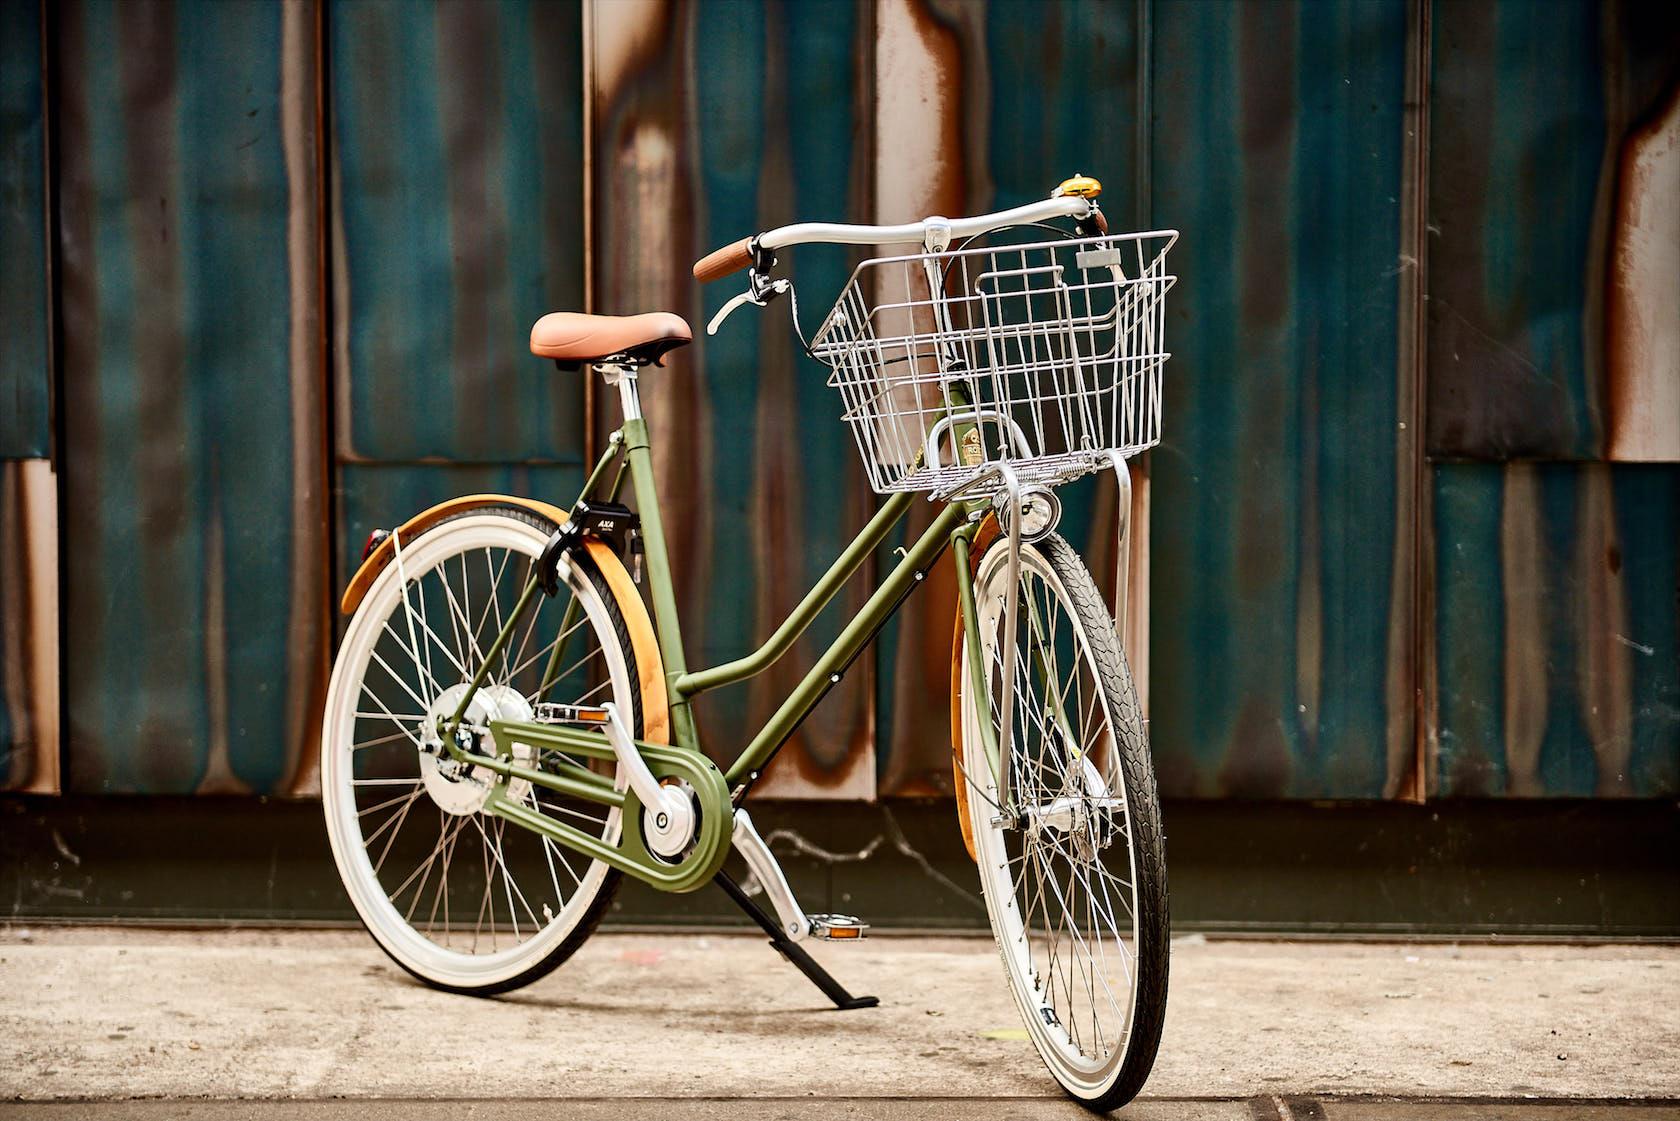 Roetz circular design bikes